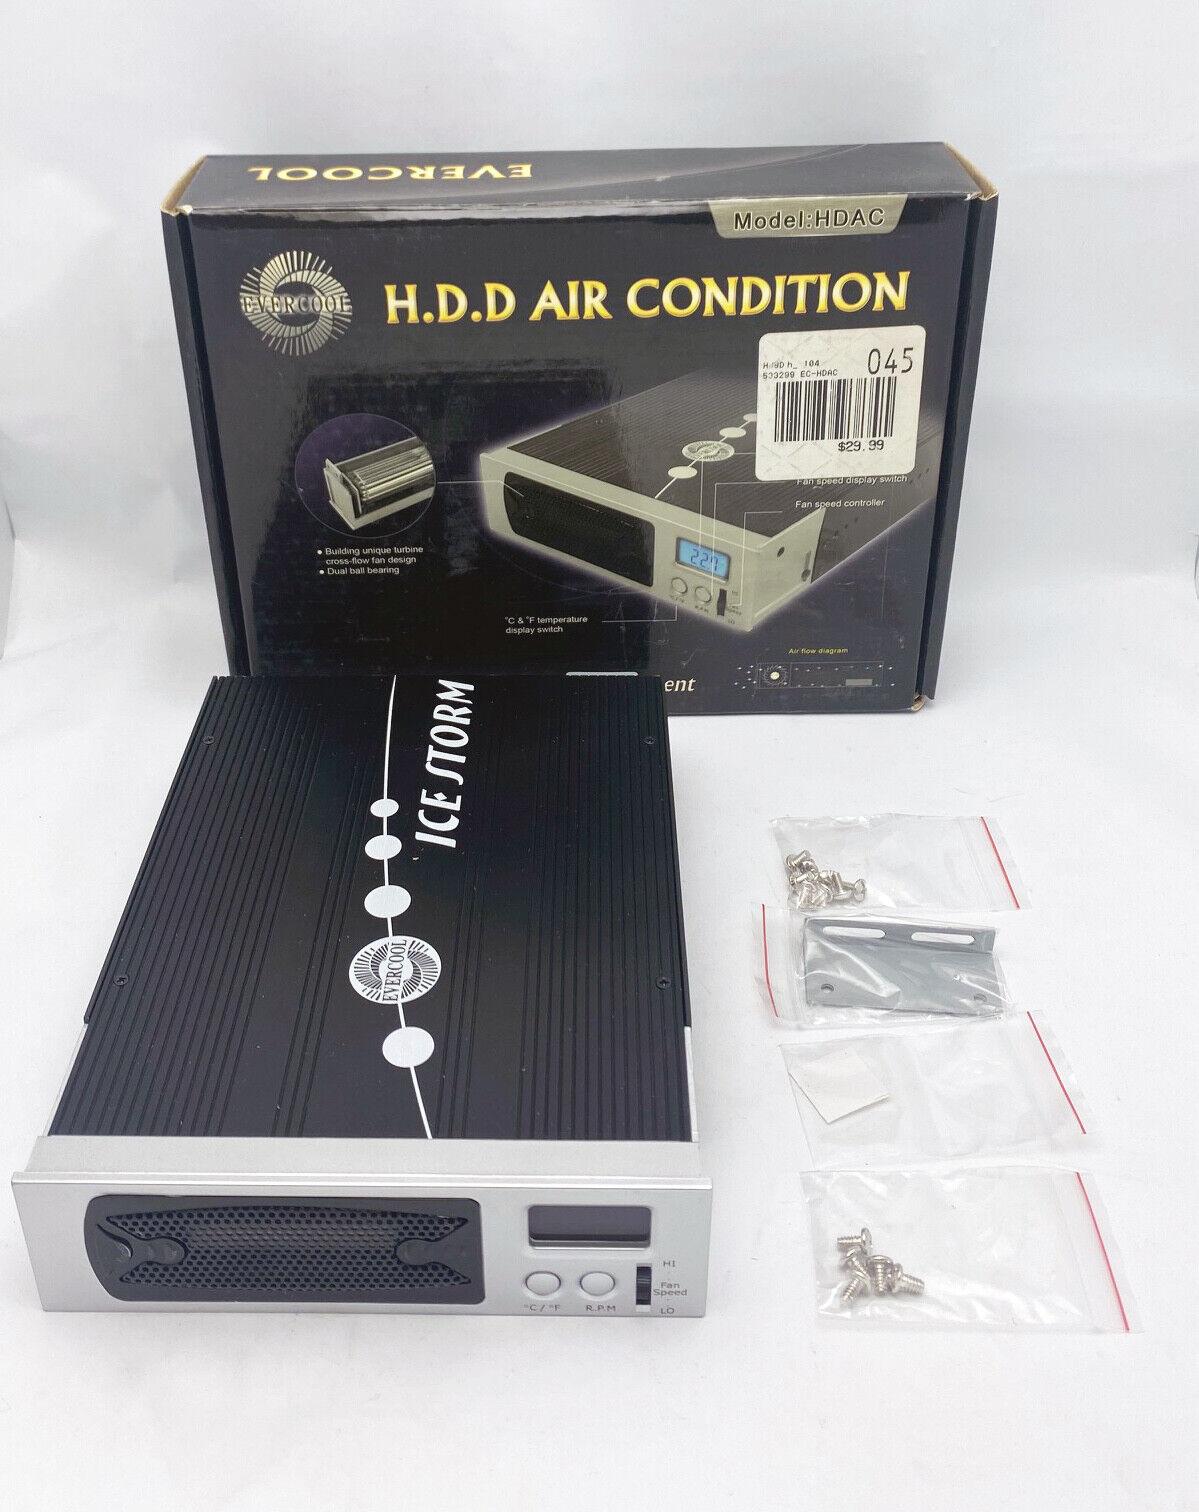 NEW Evercool Aluminum H.D.D Cooling Heatsink w/ LCD Display in 5.25